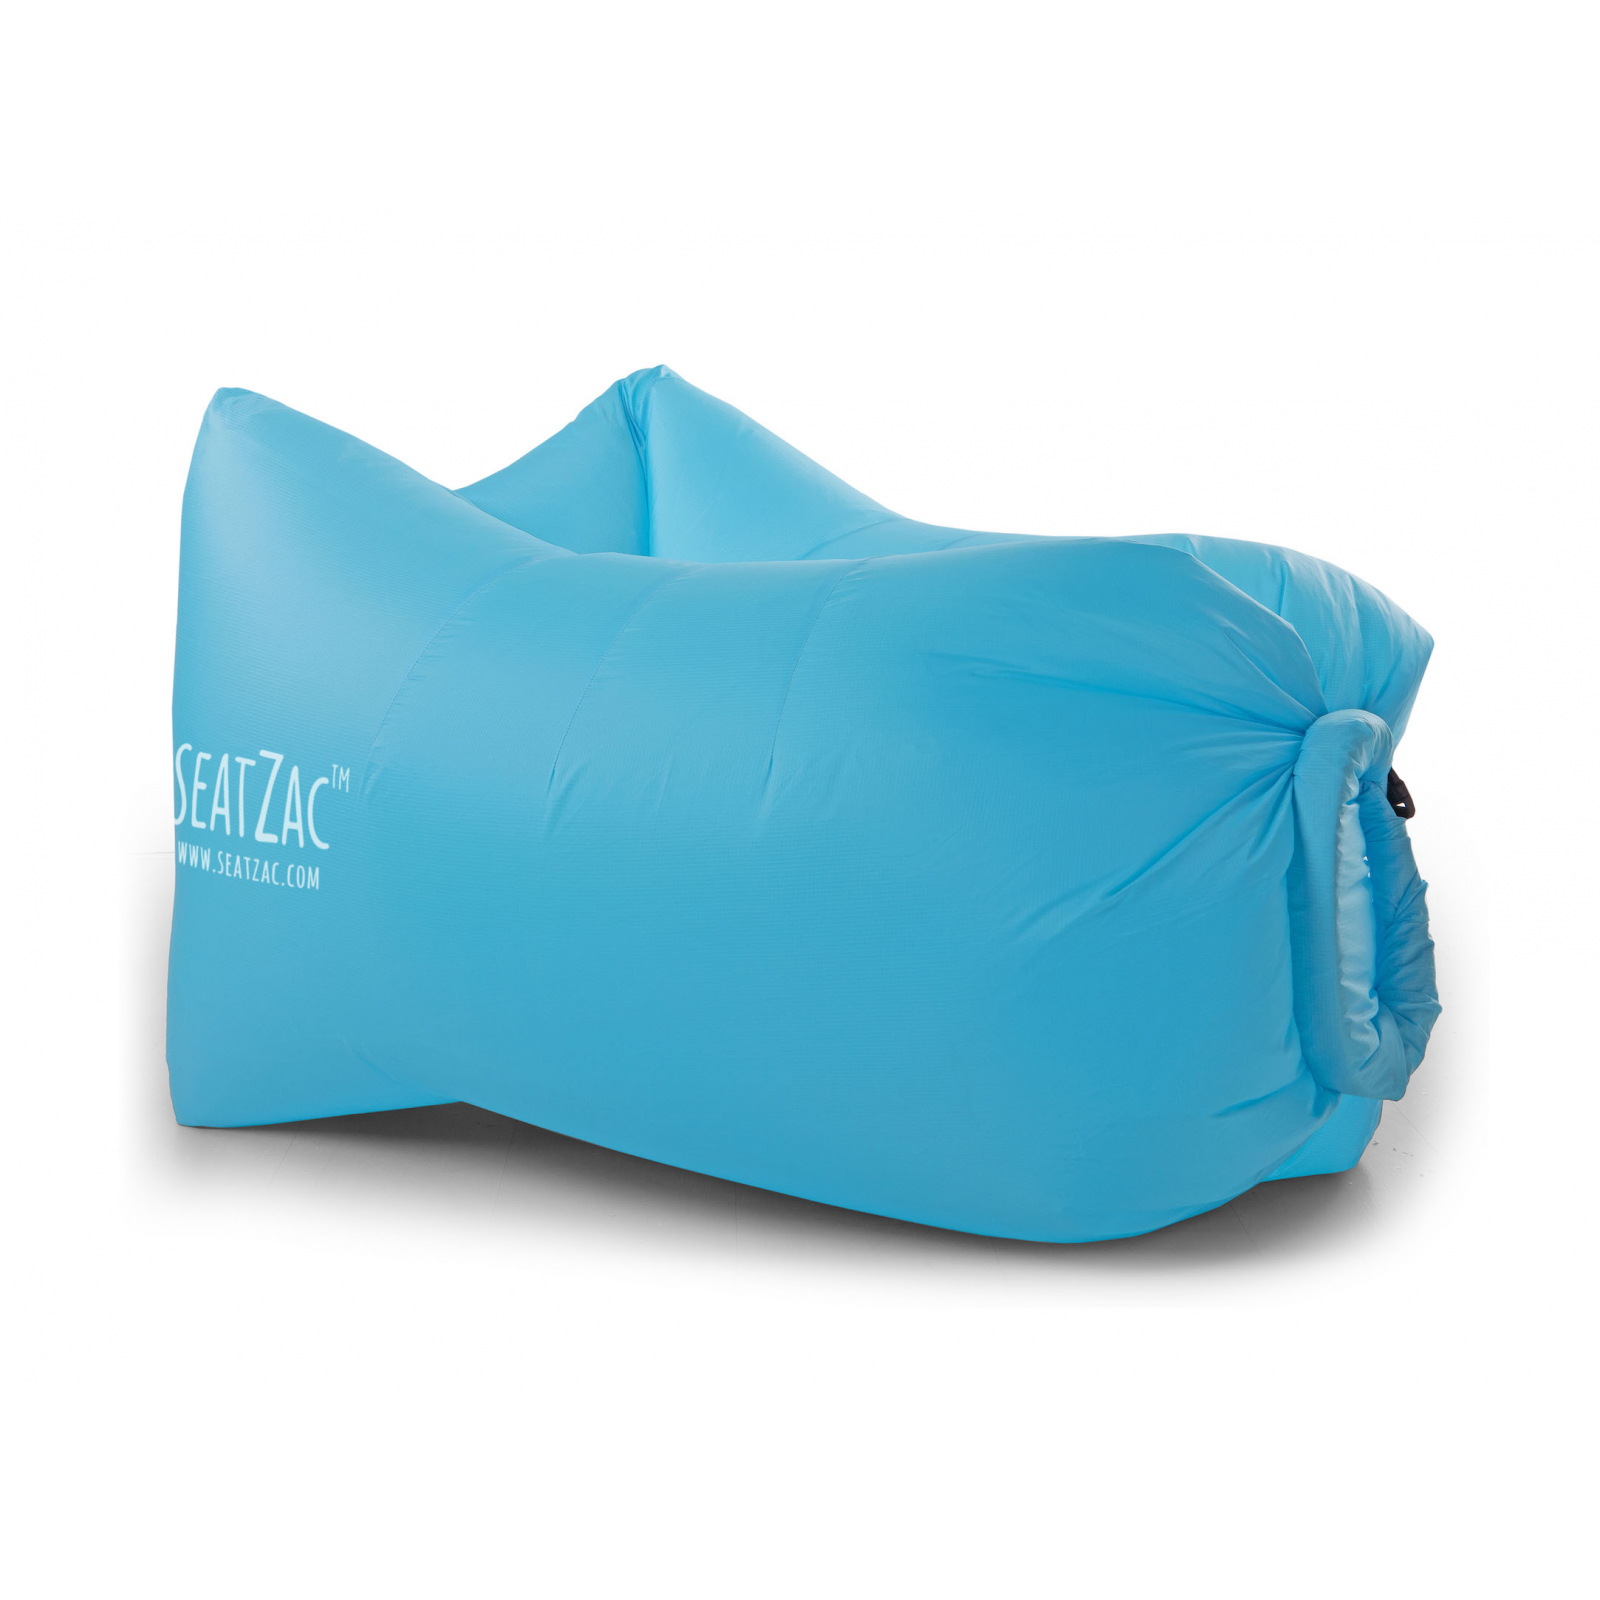 seatzac chillbag polyester inkl tragetasche blau sitzsack luftsack luftsofa ebay. Black Bedroom Furniture Sets. Home Design Ideas